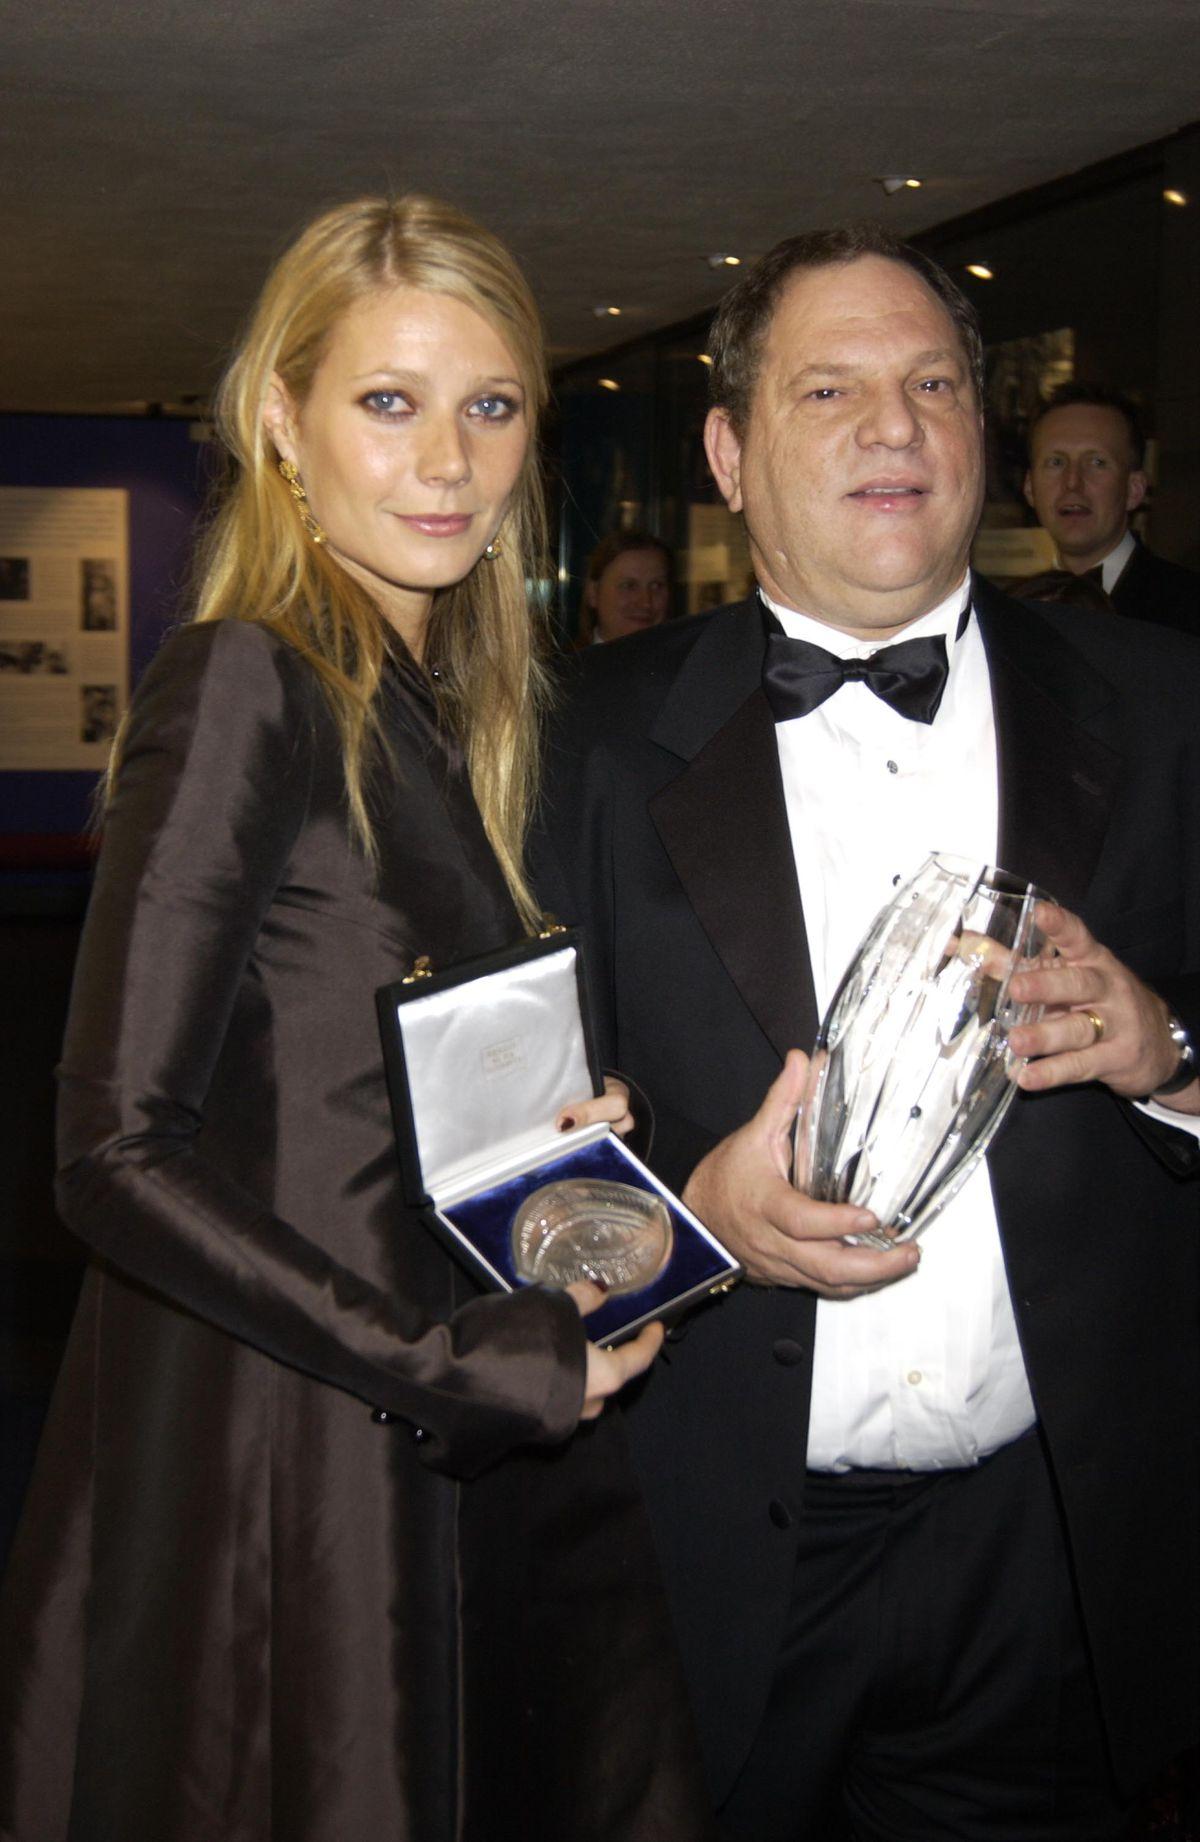 Actress Gwyneth Paltrow And Harvey Weinstein